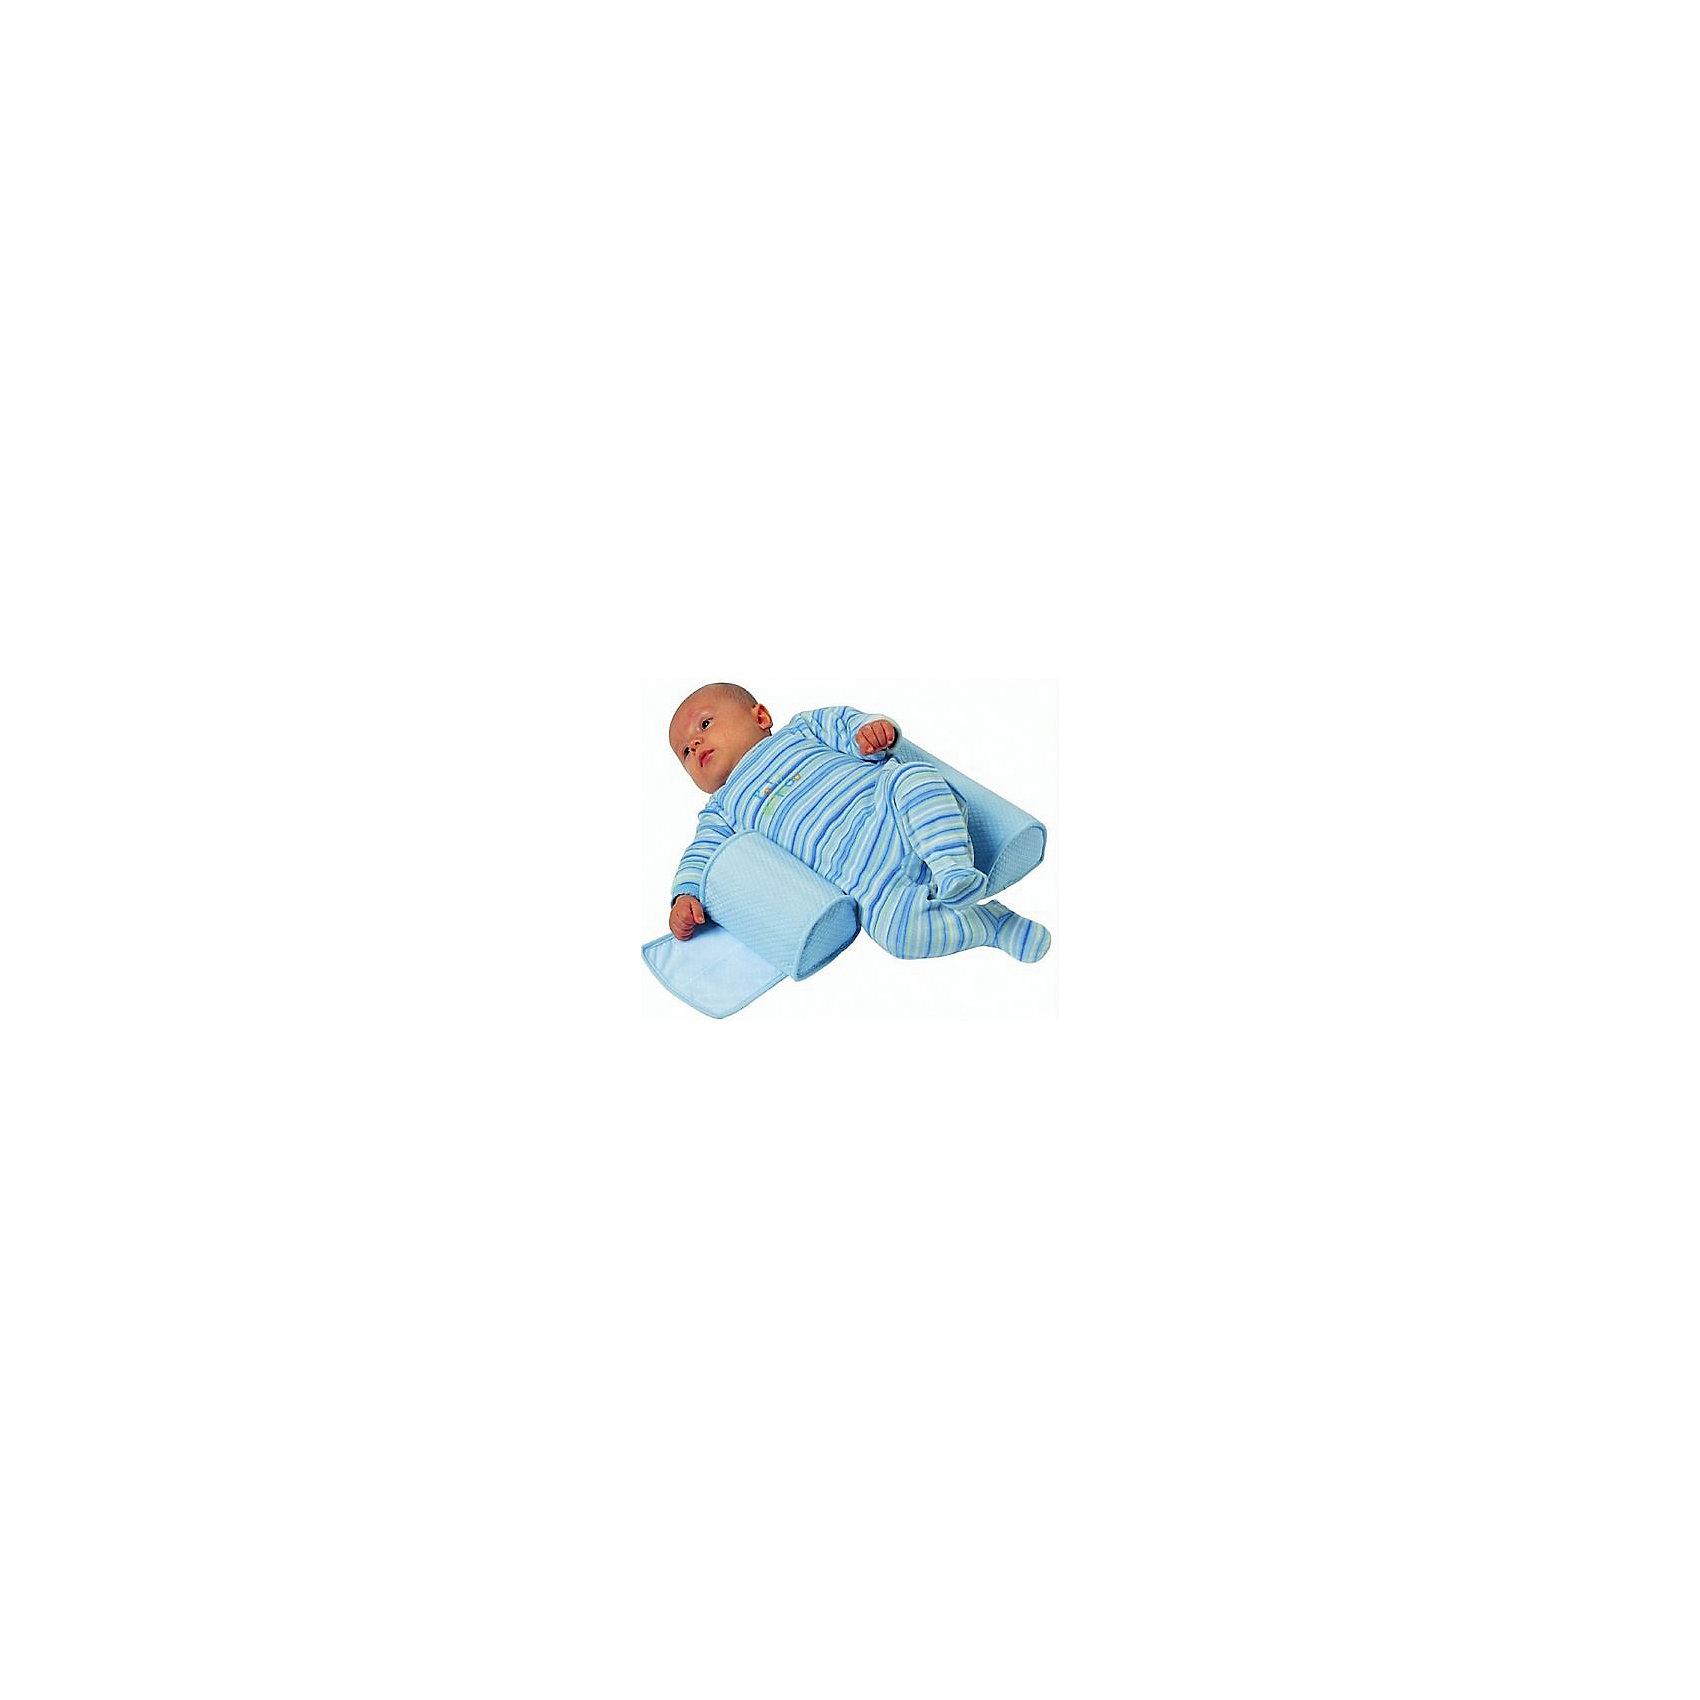 Позиционер-подушка для сна, Red Castle, голубой (RED CASTLE)